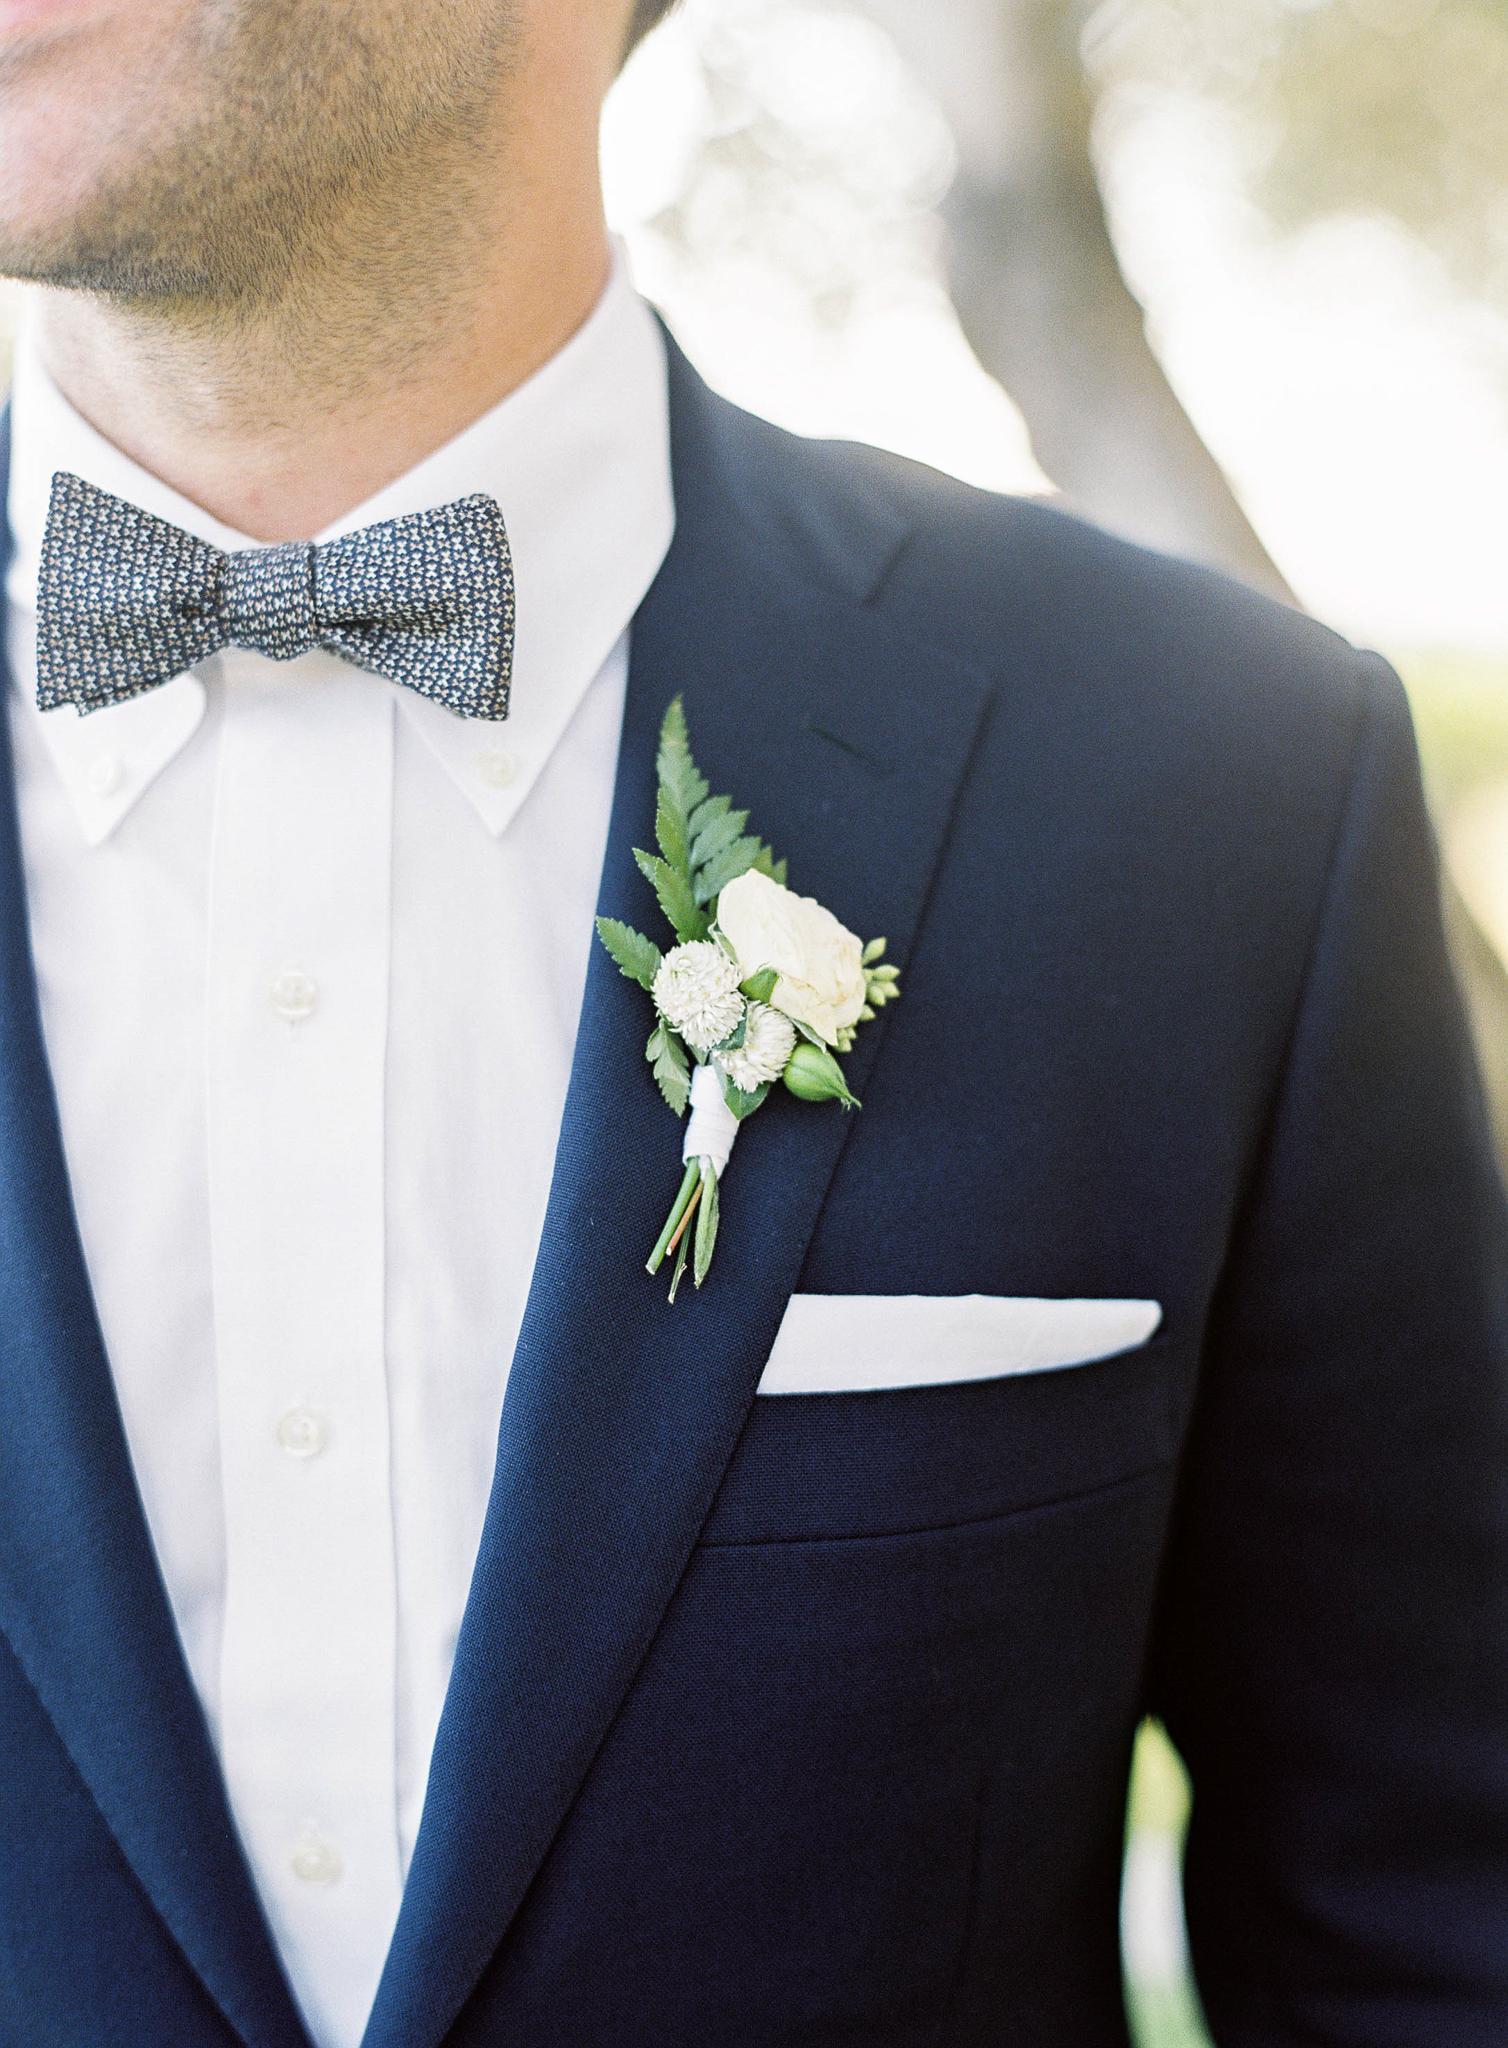 Meghan Mehan Photography - Fine Art Film Wedding Photography - San Francisco   Napa   Sonoma   Big Sur   Chicago   Minneapolis   Milwaukee   Lake Geneva   Door County   Wisconsin 055.jpg